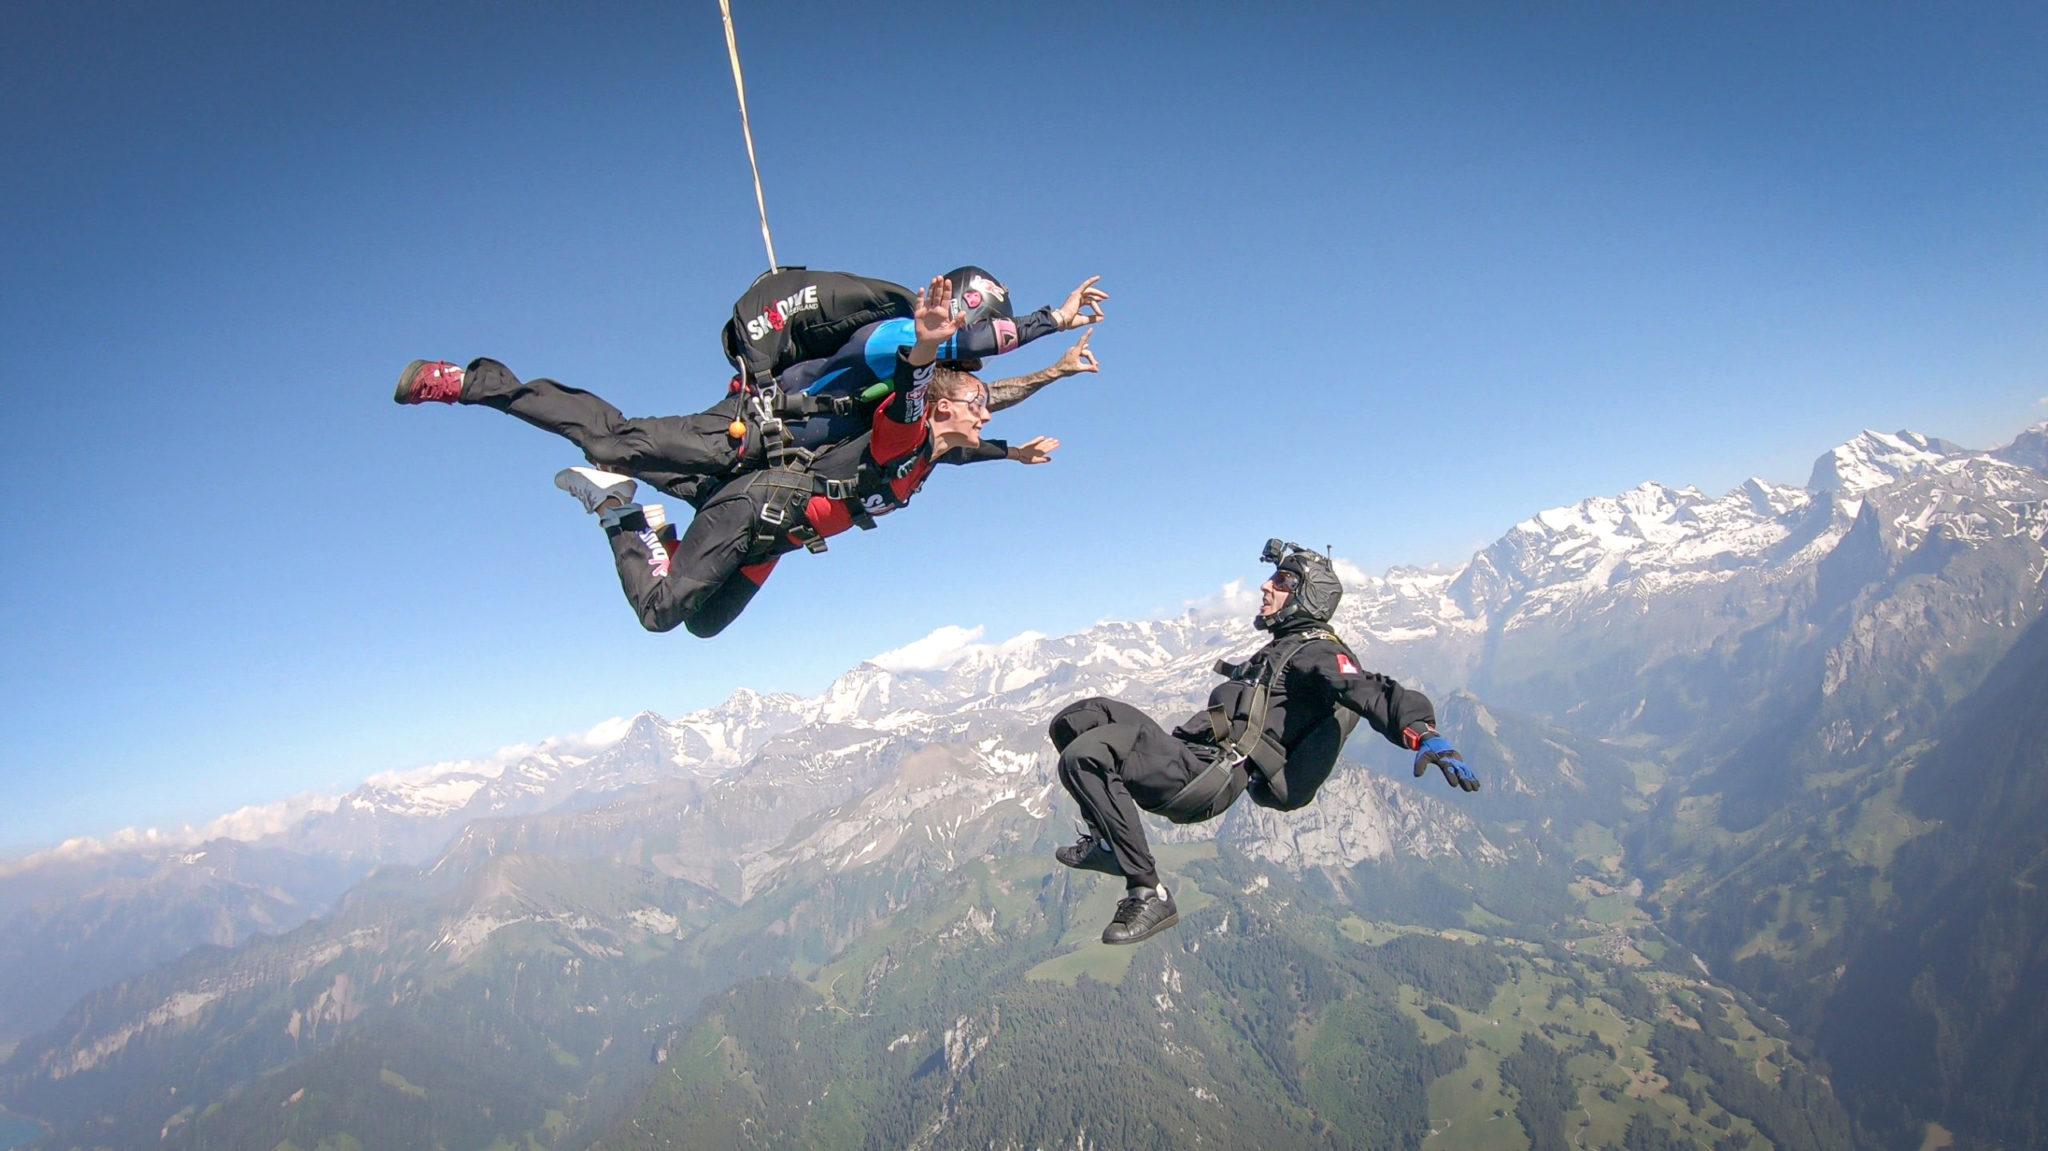 Tandem Skydiving in Switzerland